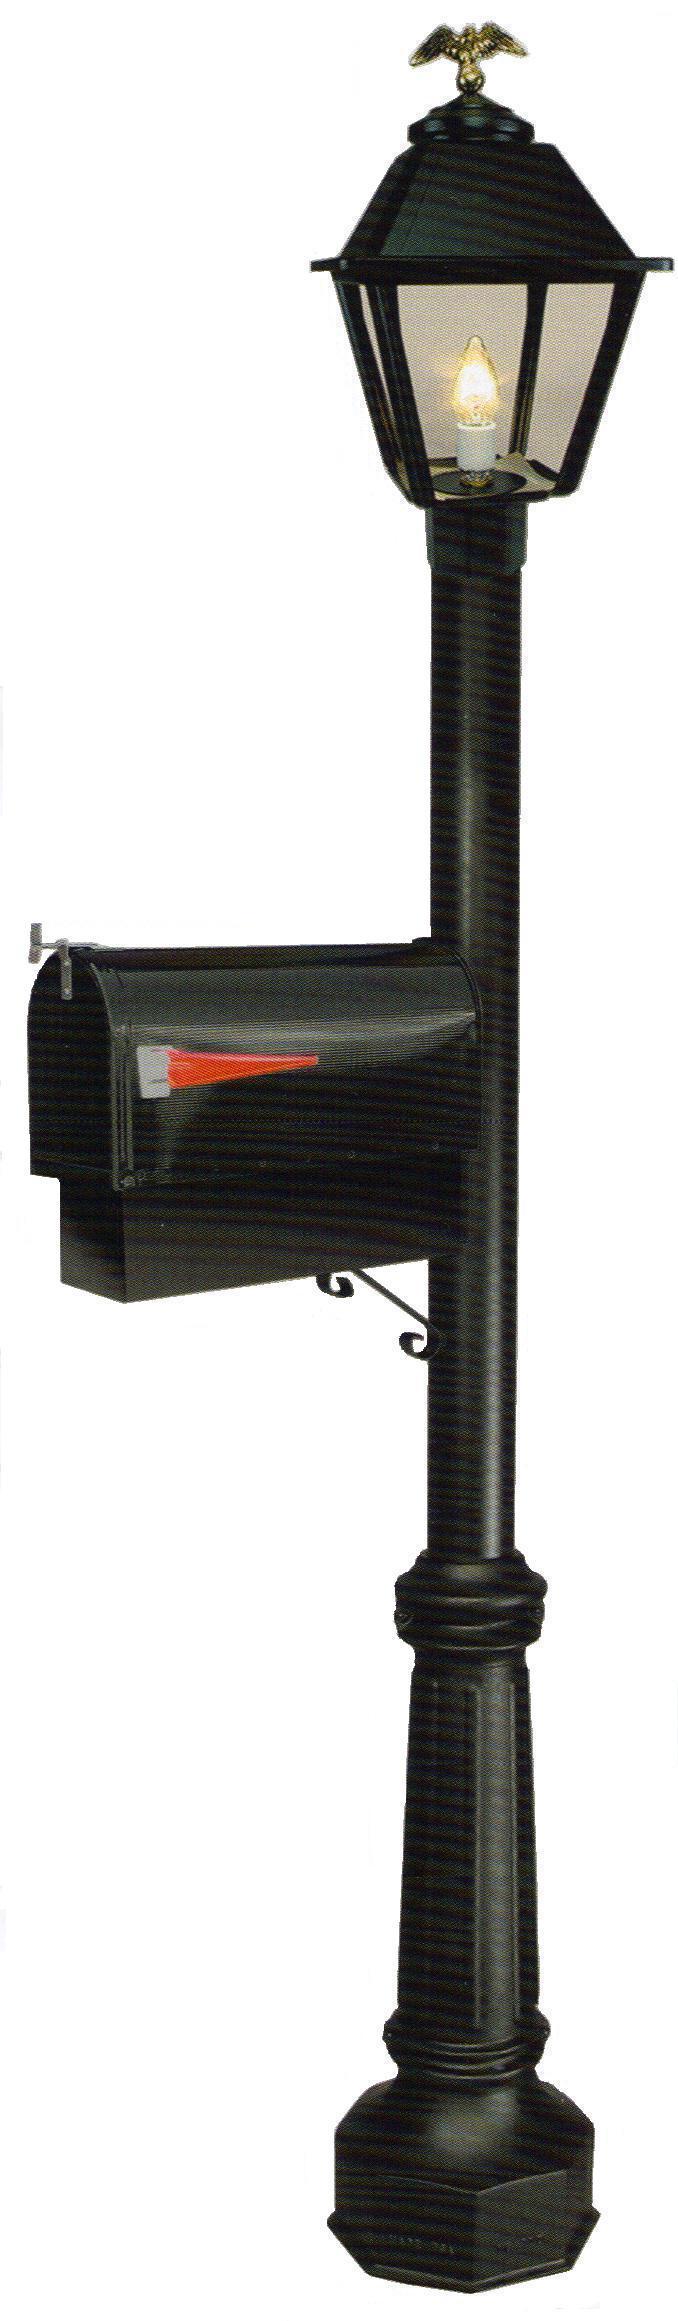 mailbox and newspaper holder posts outdoor gas street. Black Bedroom Furniture Sets. Home Design Ideas